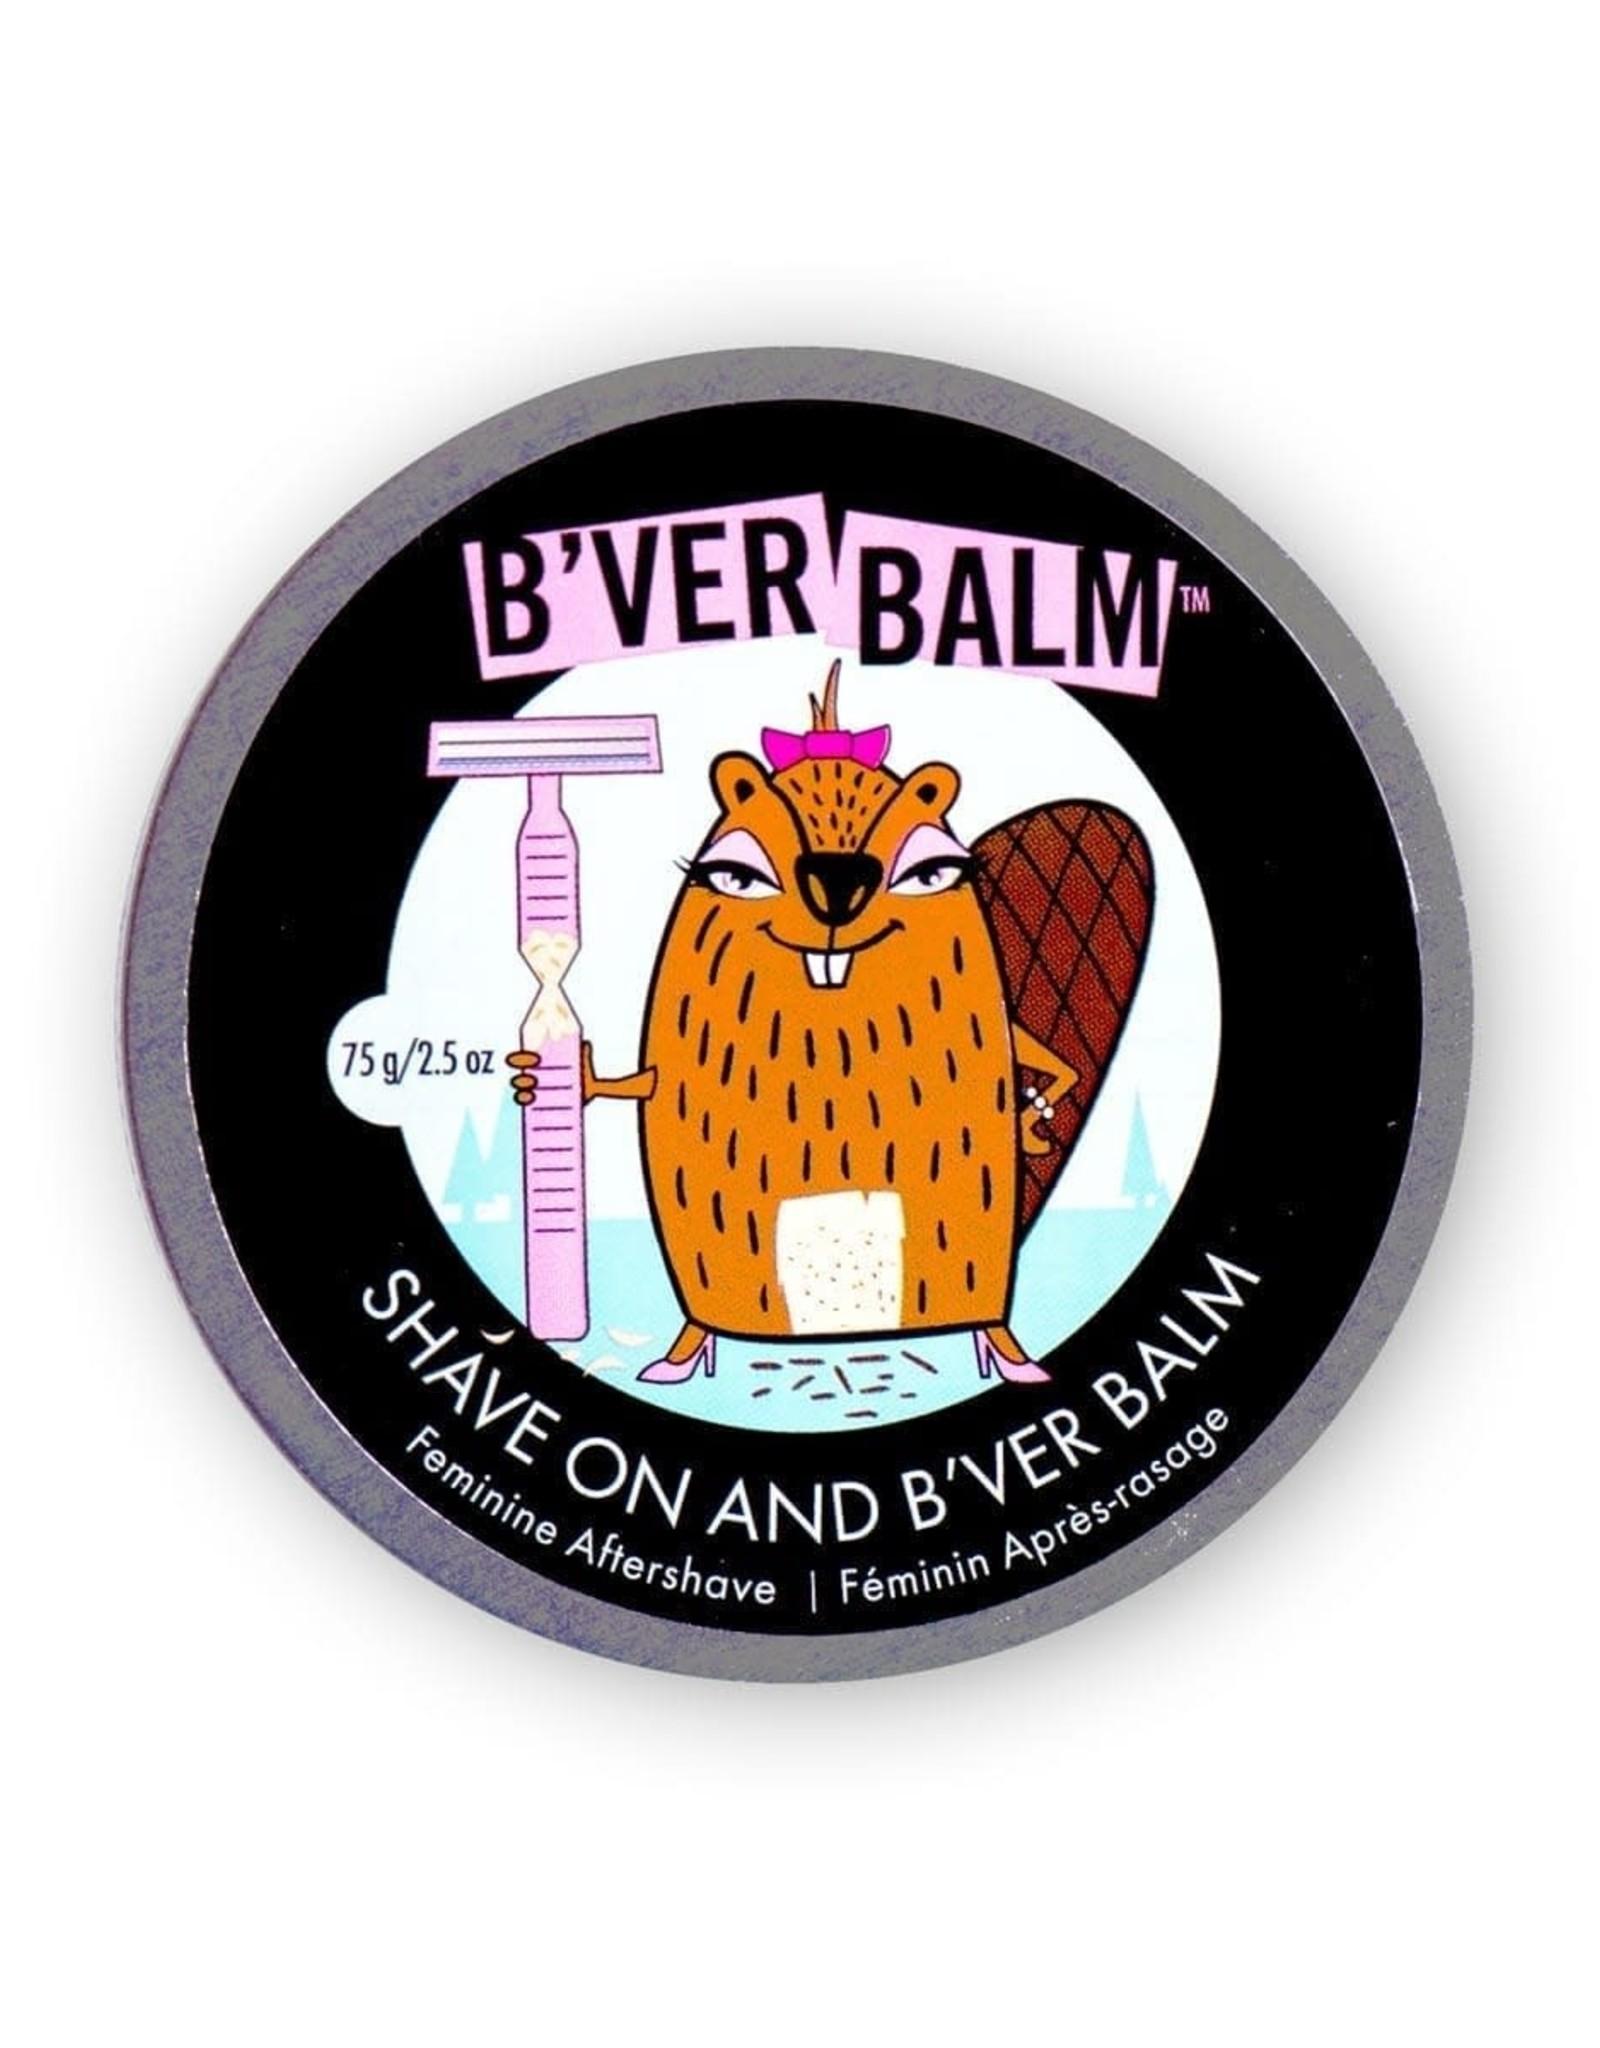 Walton Wood Farms B'ver Balm Feminine Aftershave 2.5 oz